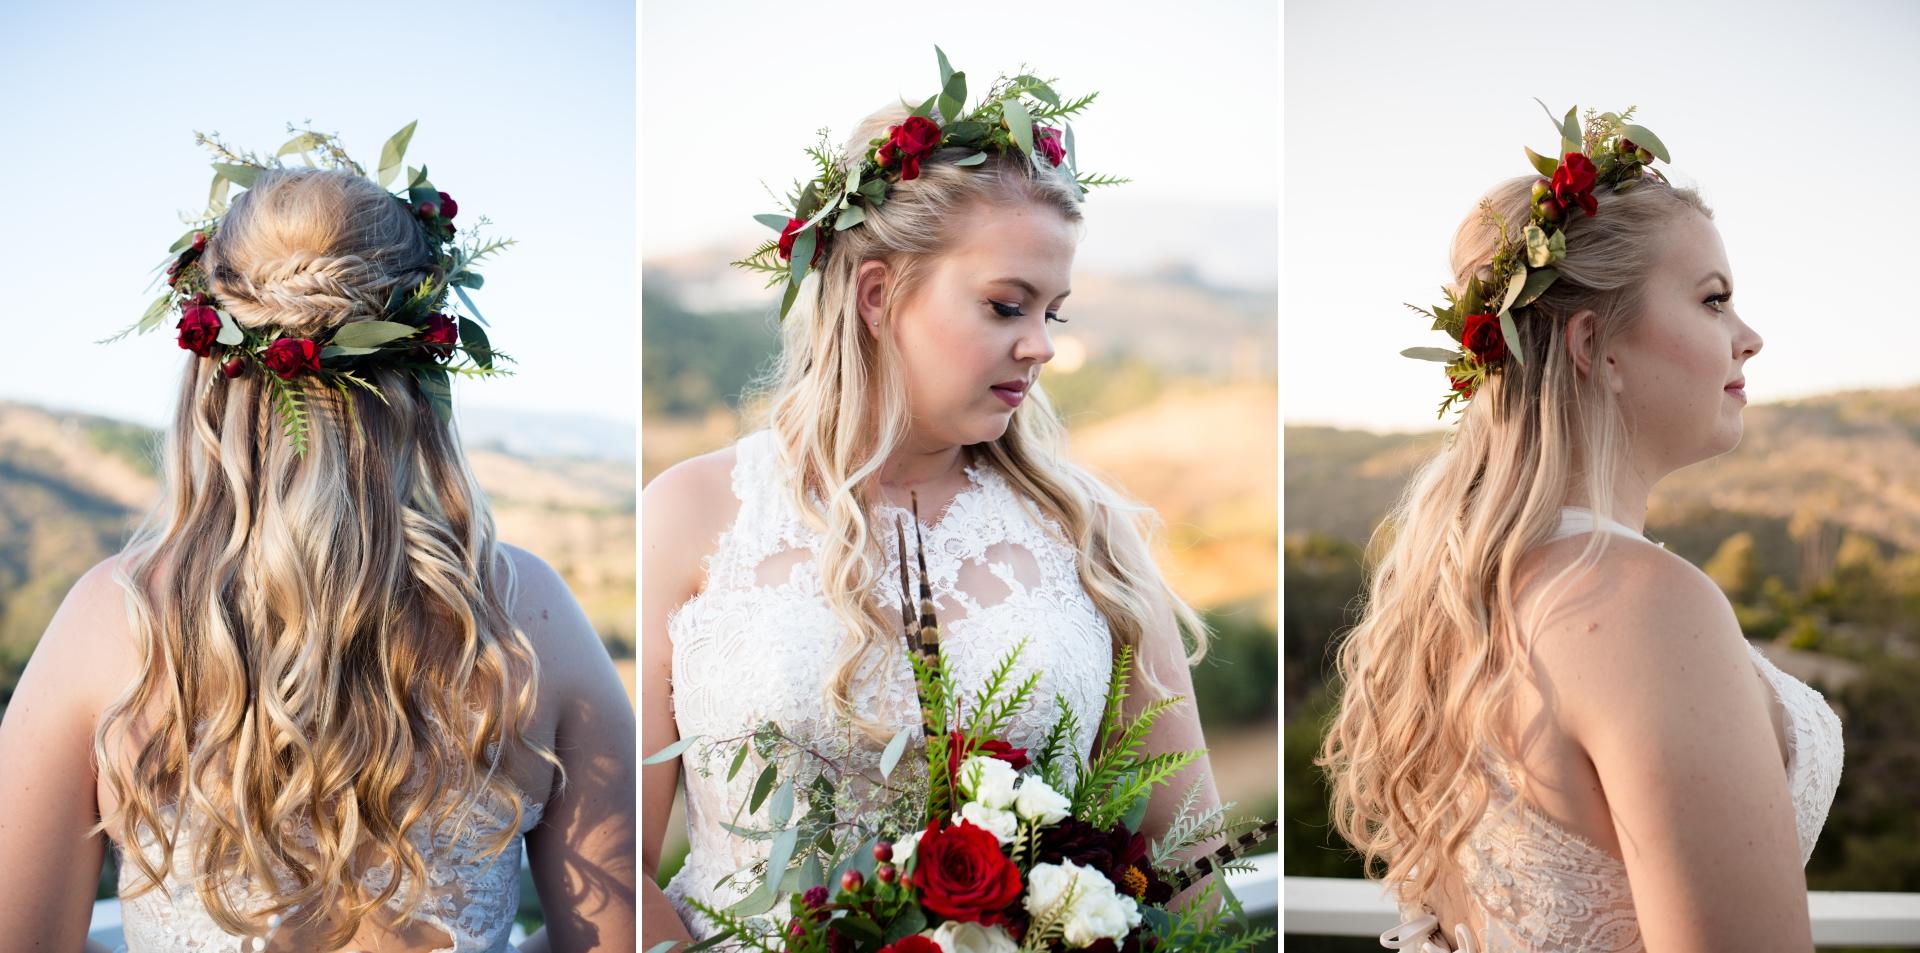 Kelly Dawn Wedding Hair and Makeup